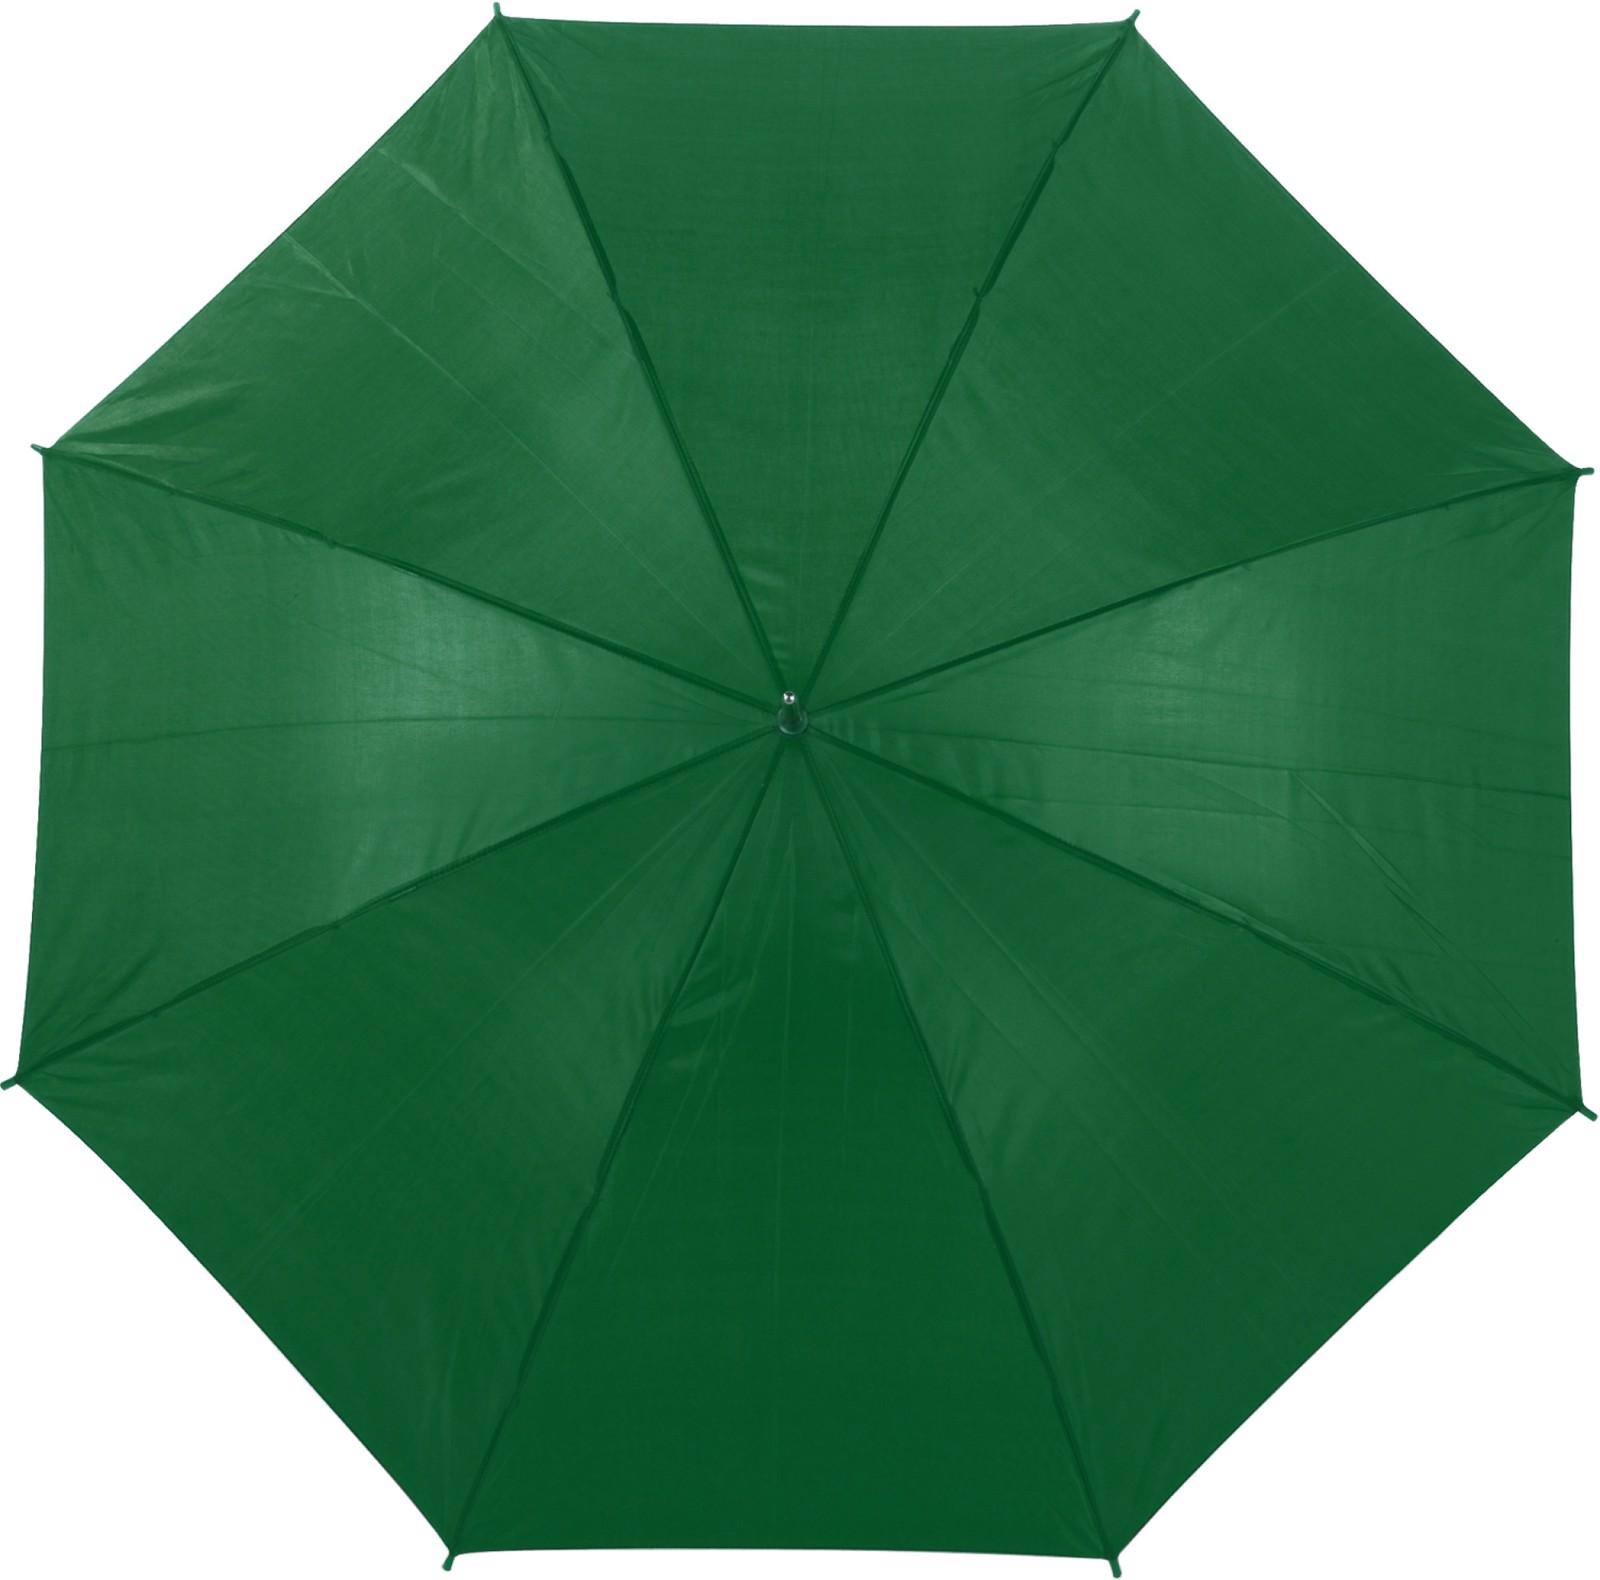 Polyester (190T) umbrella - Green